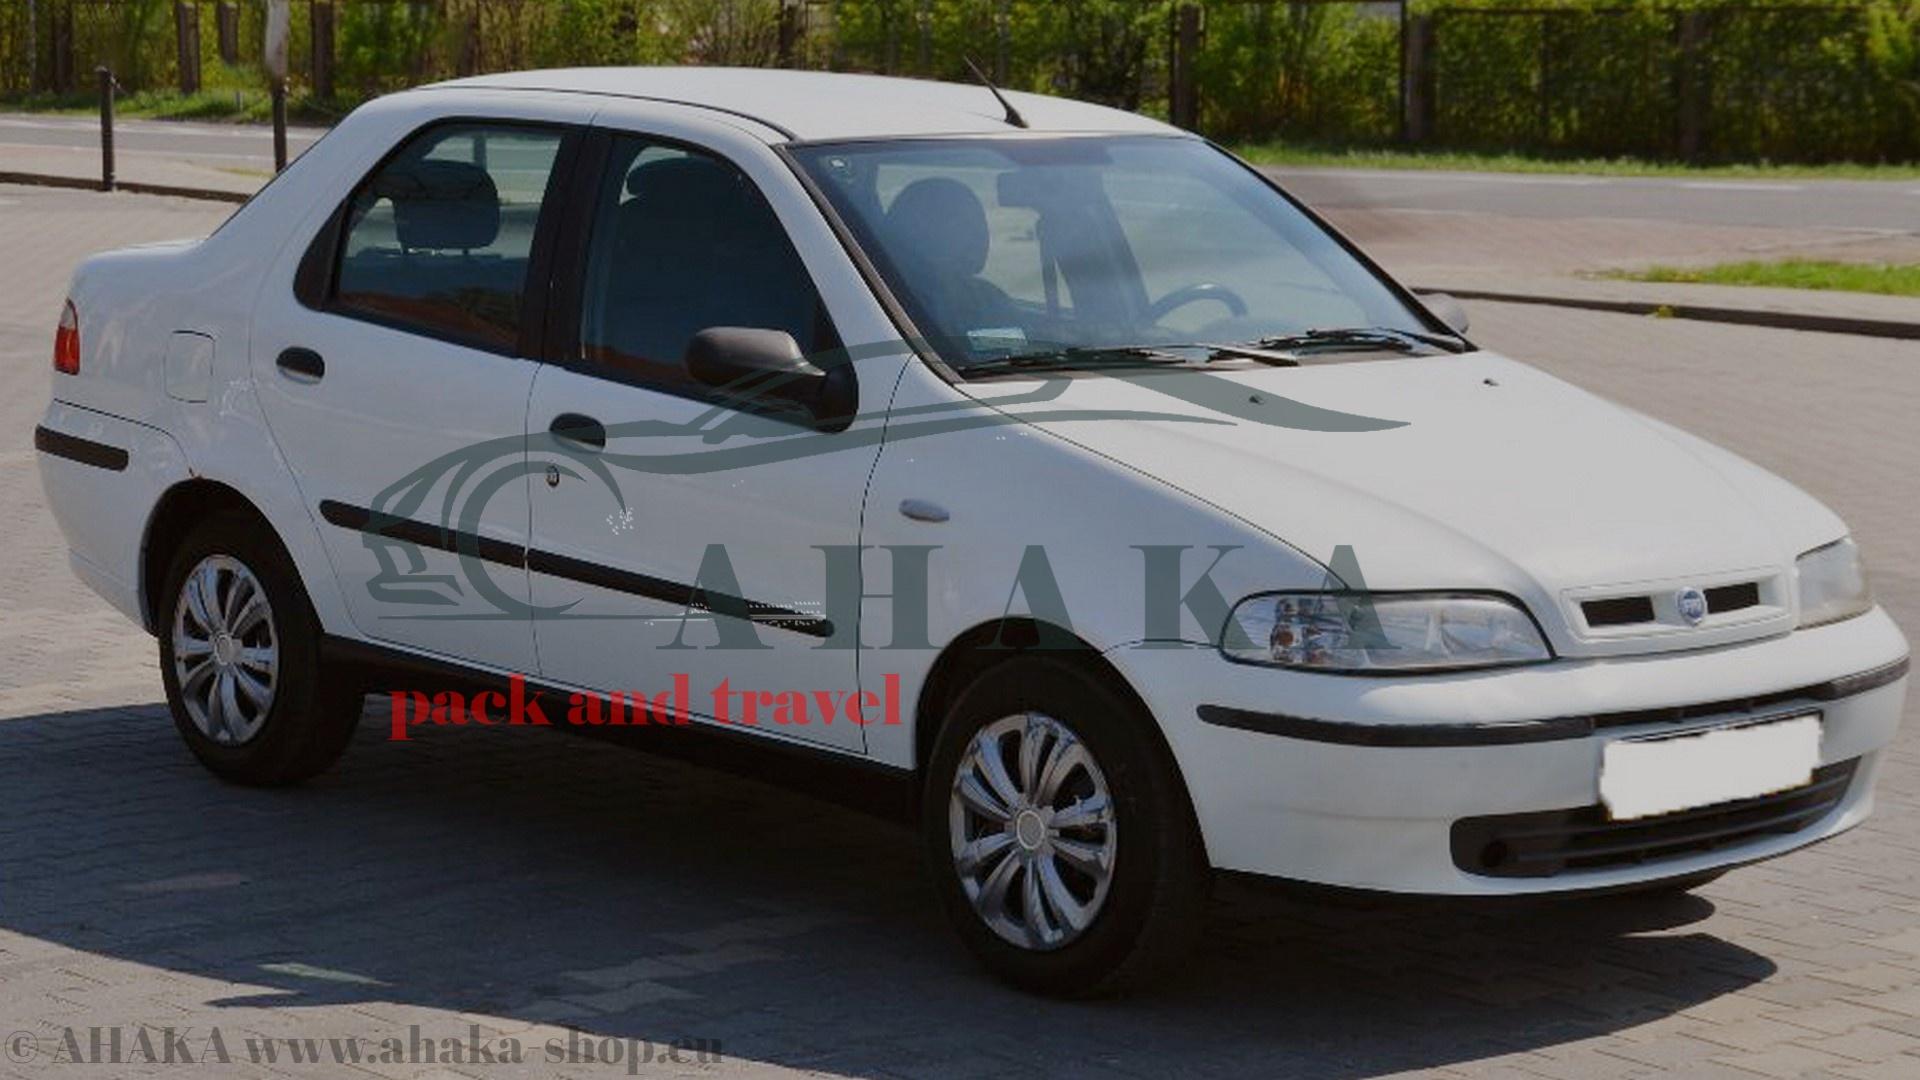 AUTO HAK Anhängerkupplung starr Für Audi A6 Limousine 04 13polig E-Satz neu